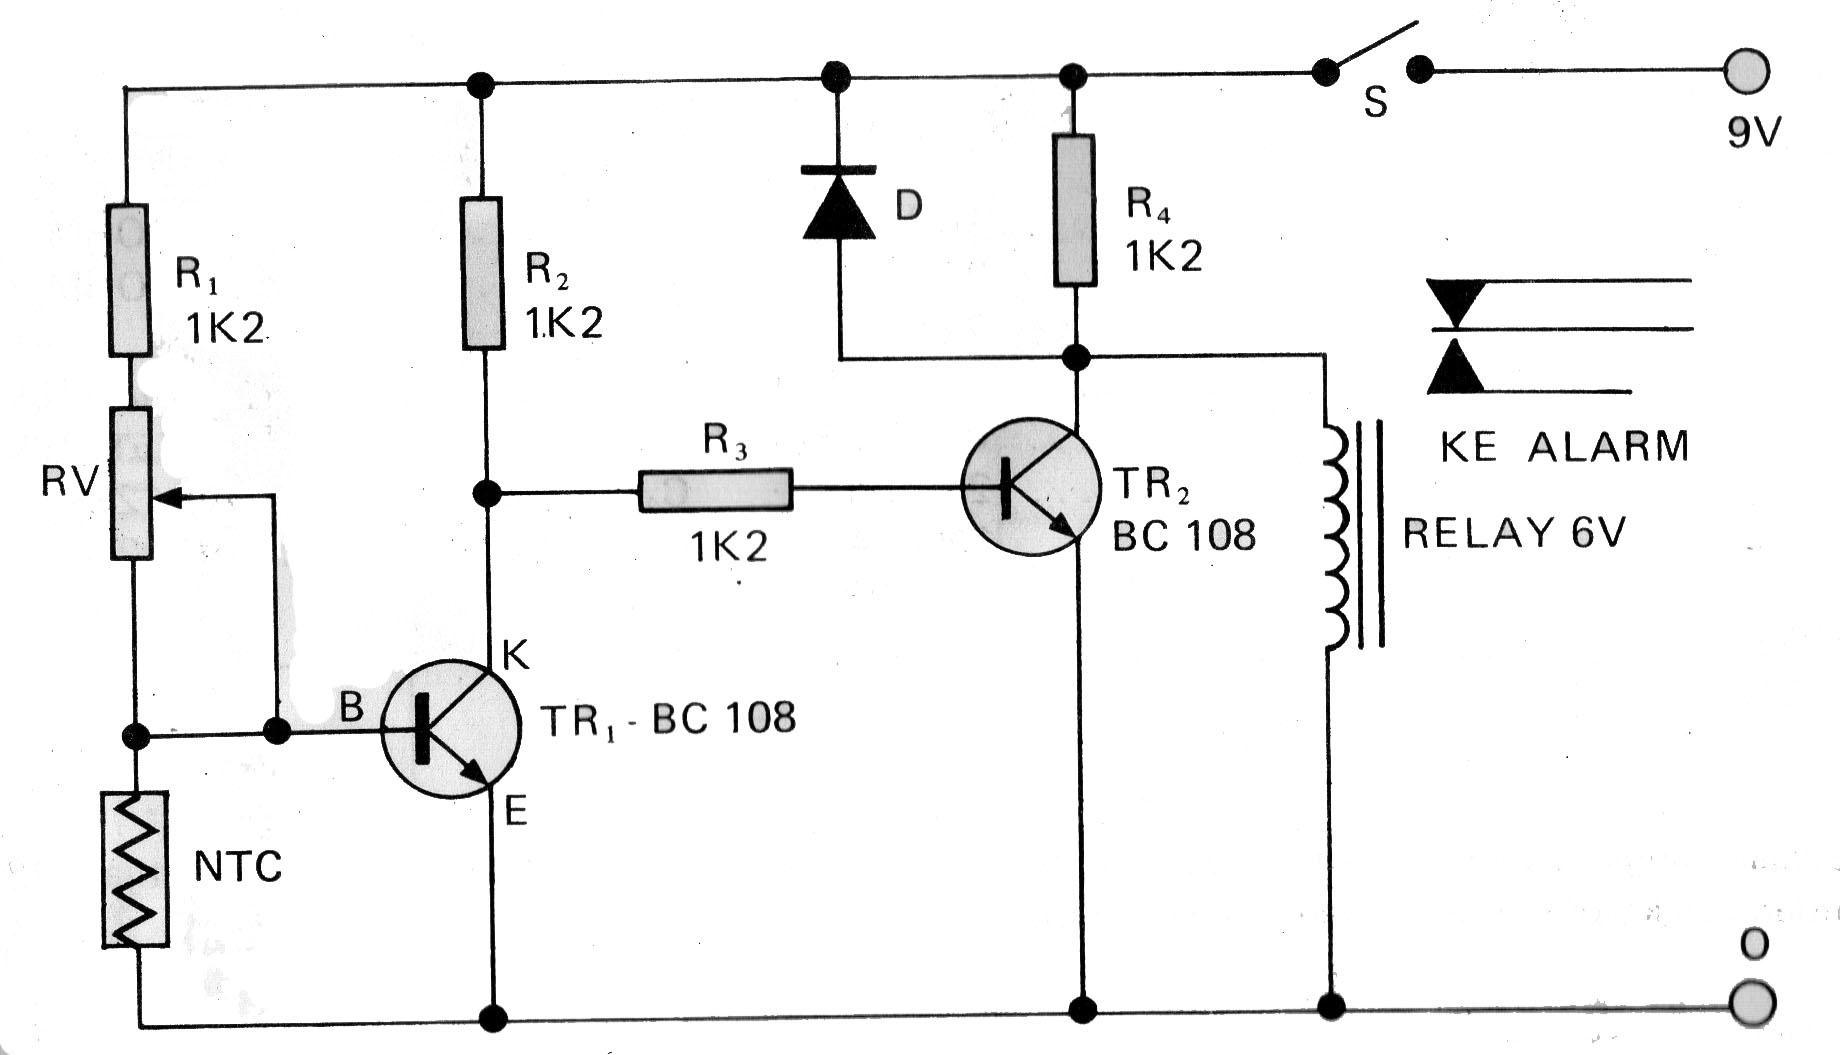 skema rangkaian elektronika rangkaian pengendali lu taman otomatis gambar skema